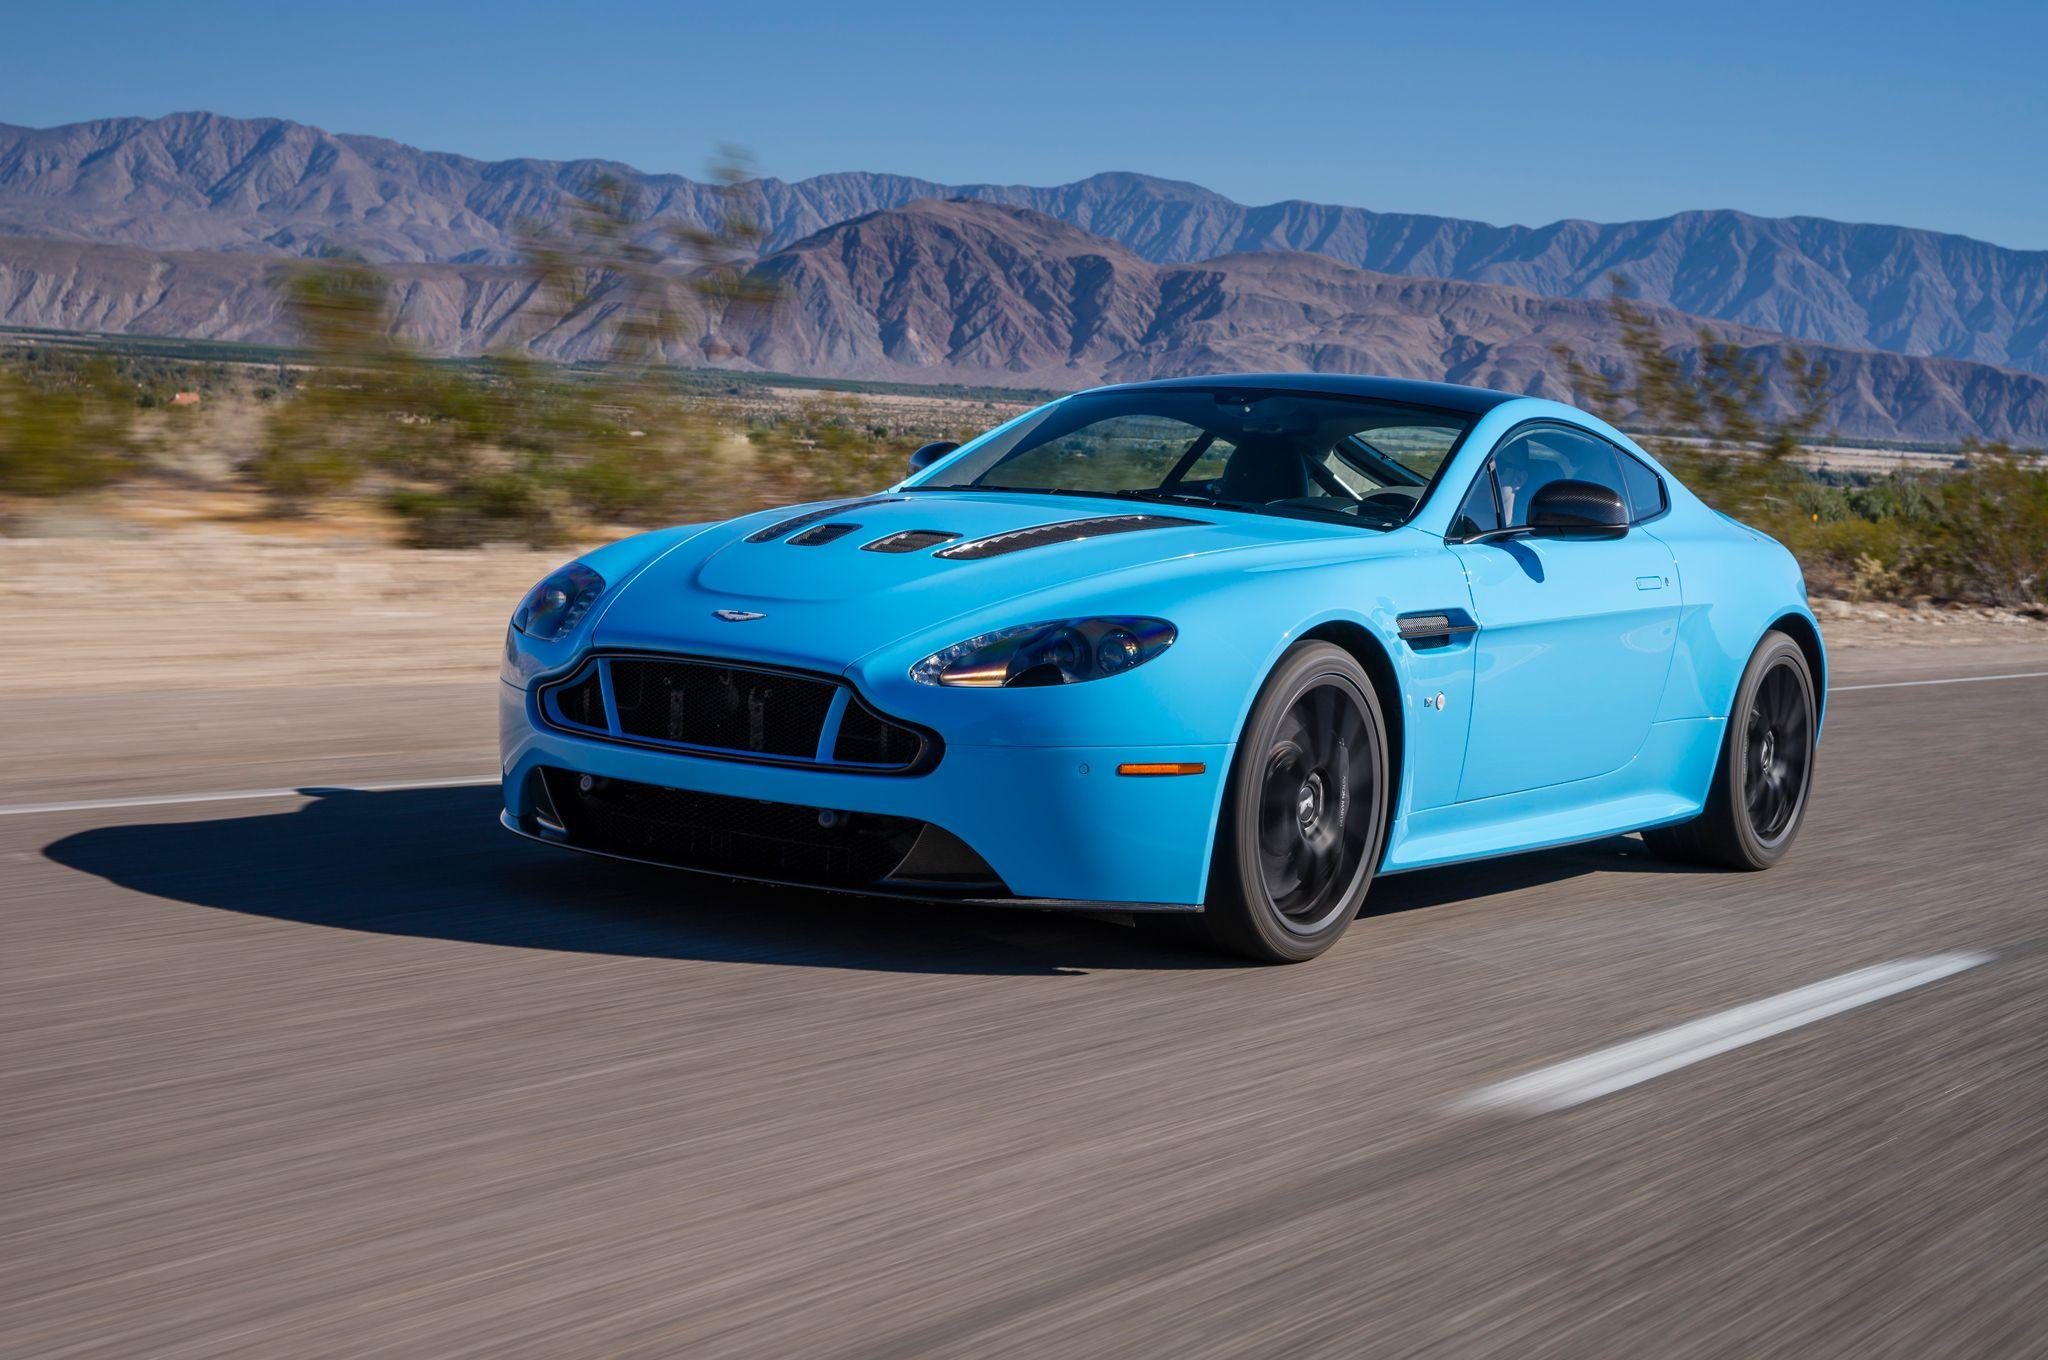 Aston Martin V12 Vantage Cars Pinterest